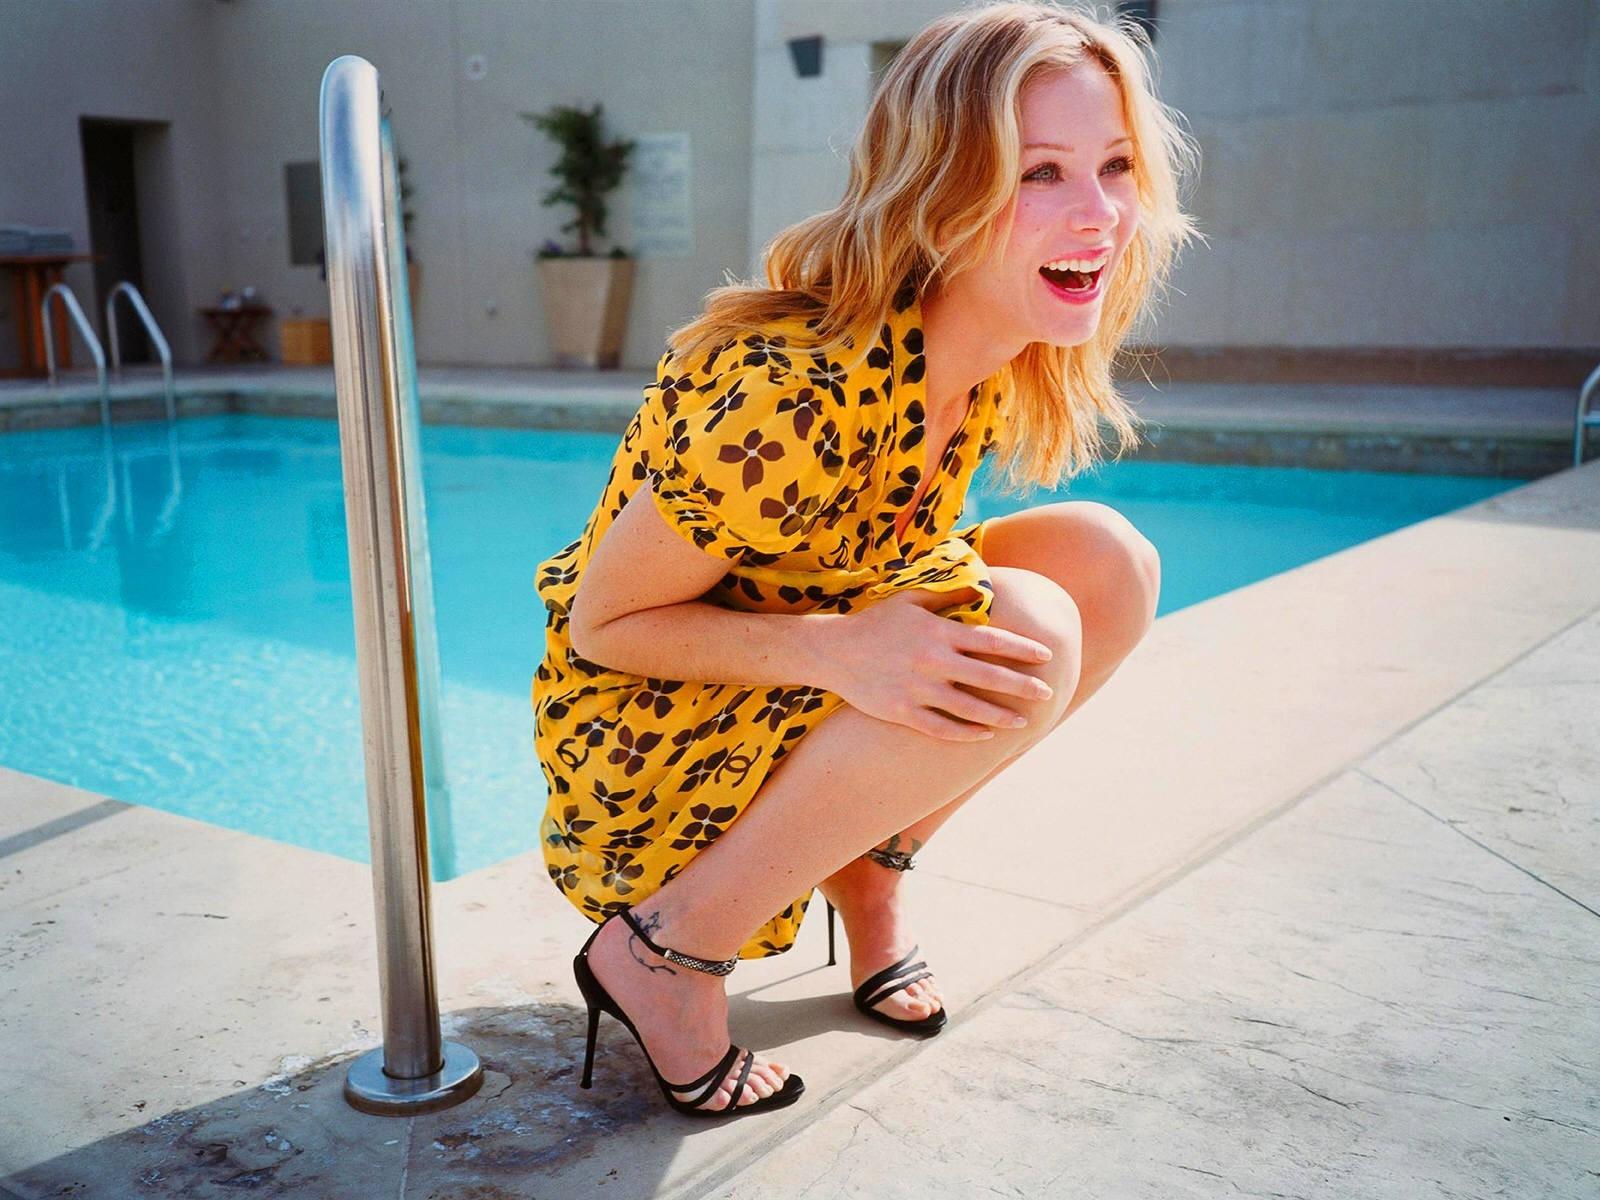 Wallpaper: Christina Applegate a bordo piscina